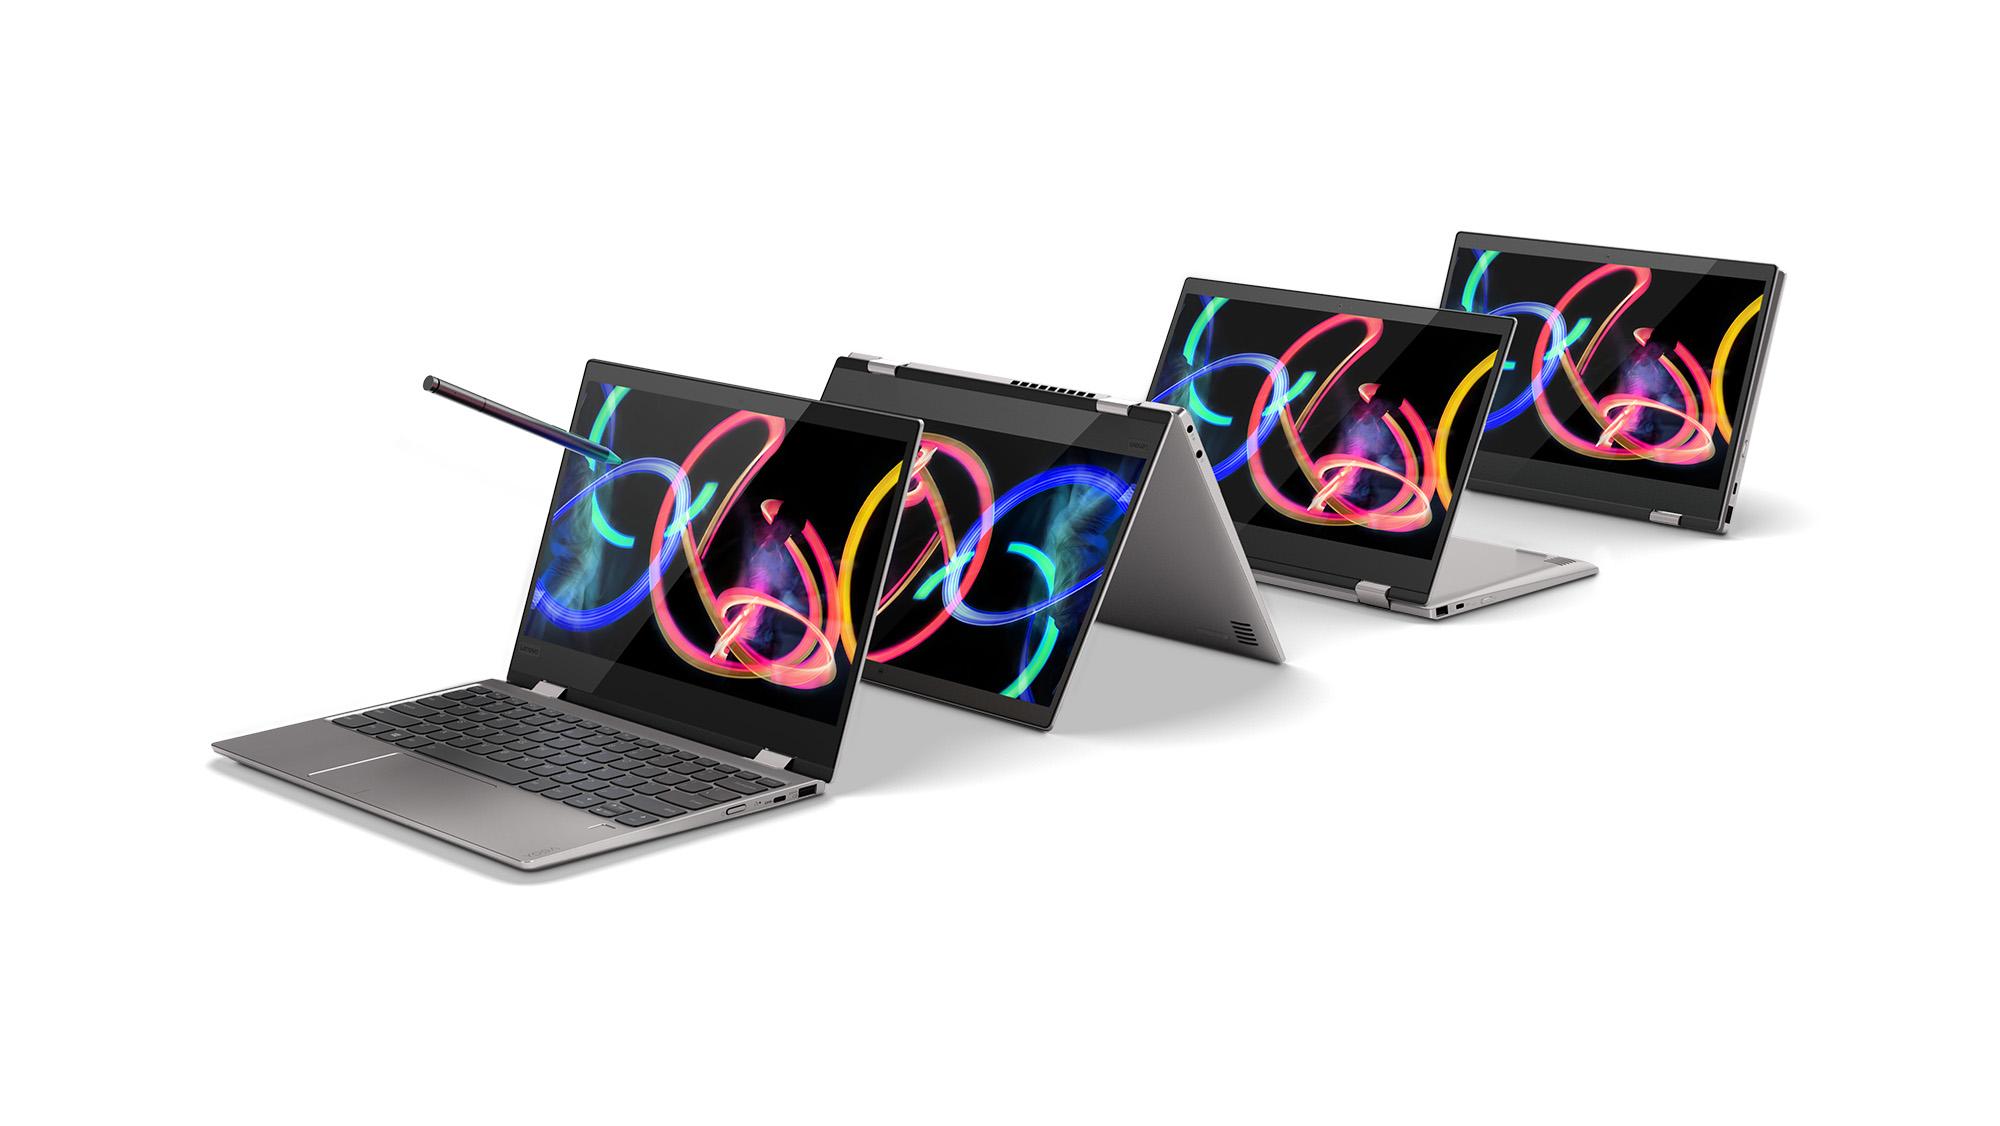 Lenovo-Yoga-920-Yoga-720-Miix-510-01.jpg